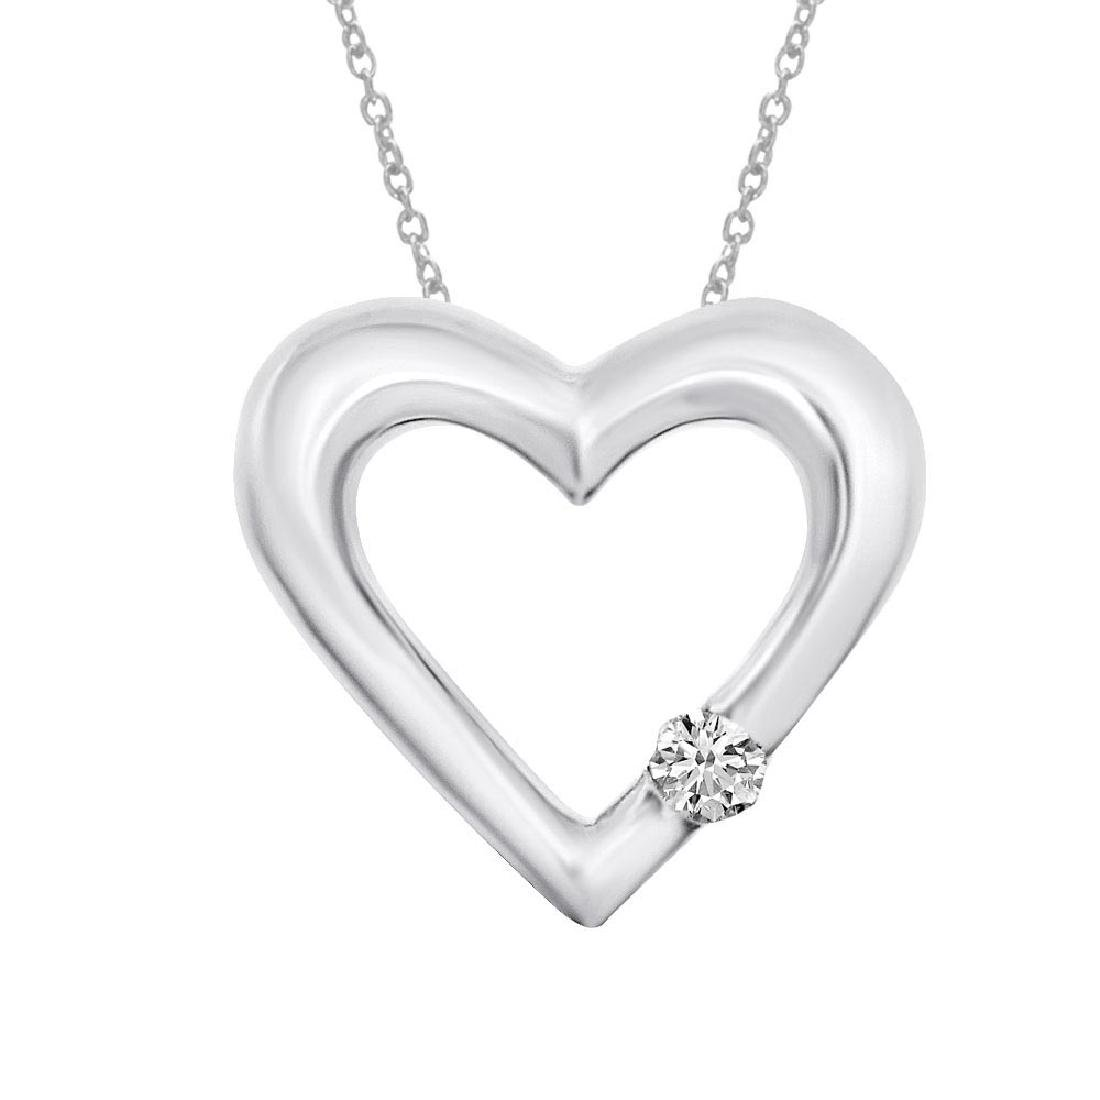 Certified 14K White Gold Diamond Heart Pendant 0.07 CTW